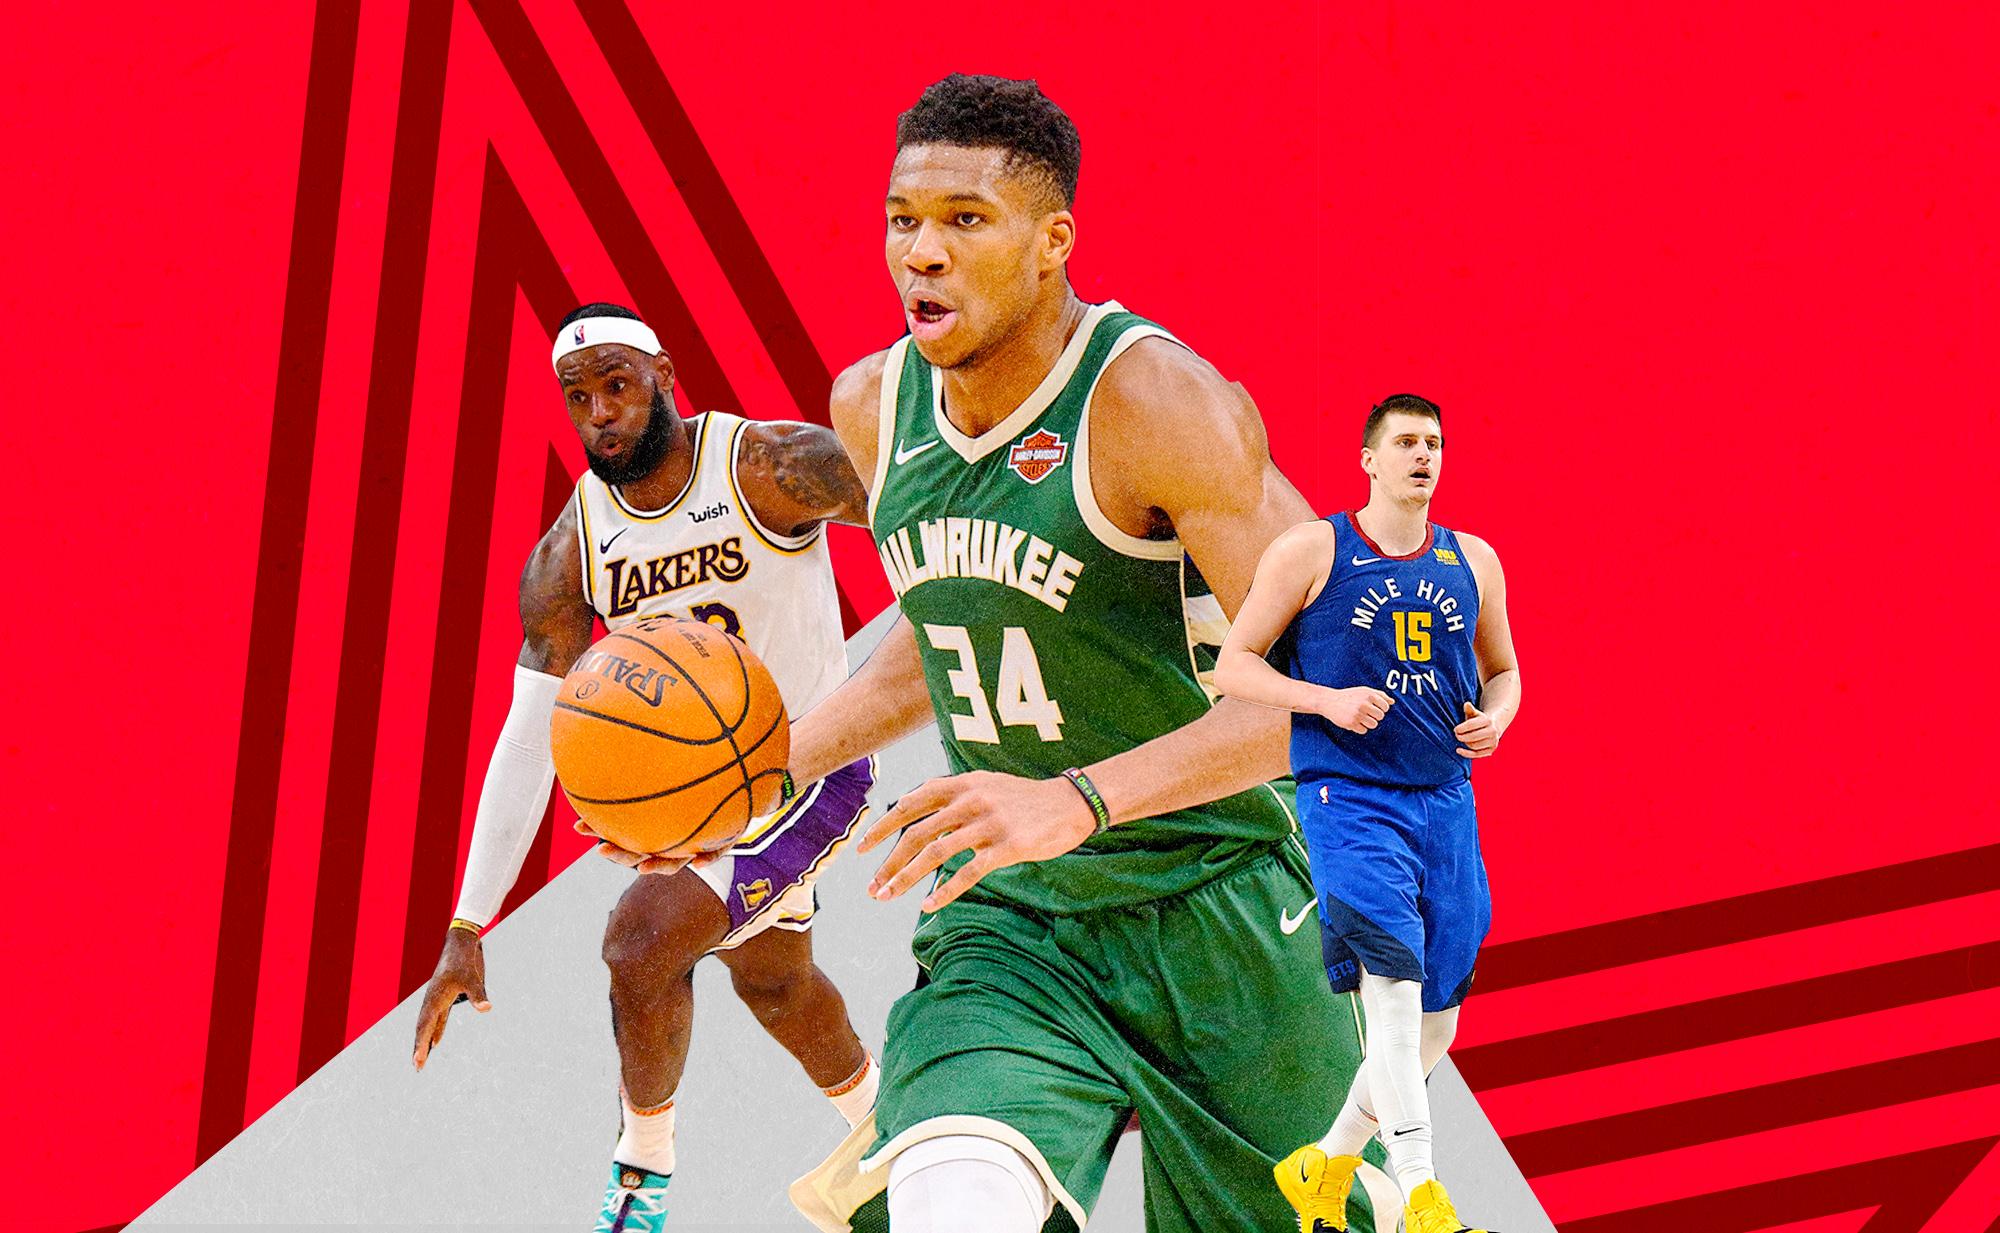 NBA predictions for the 2019-2020 season